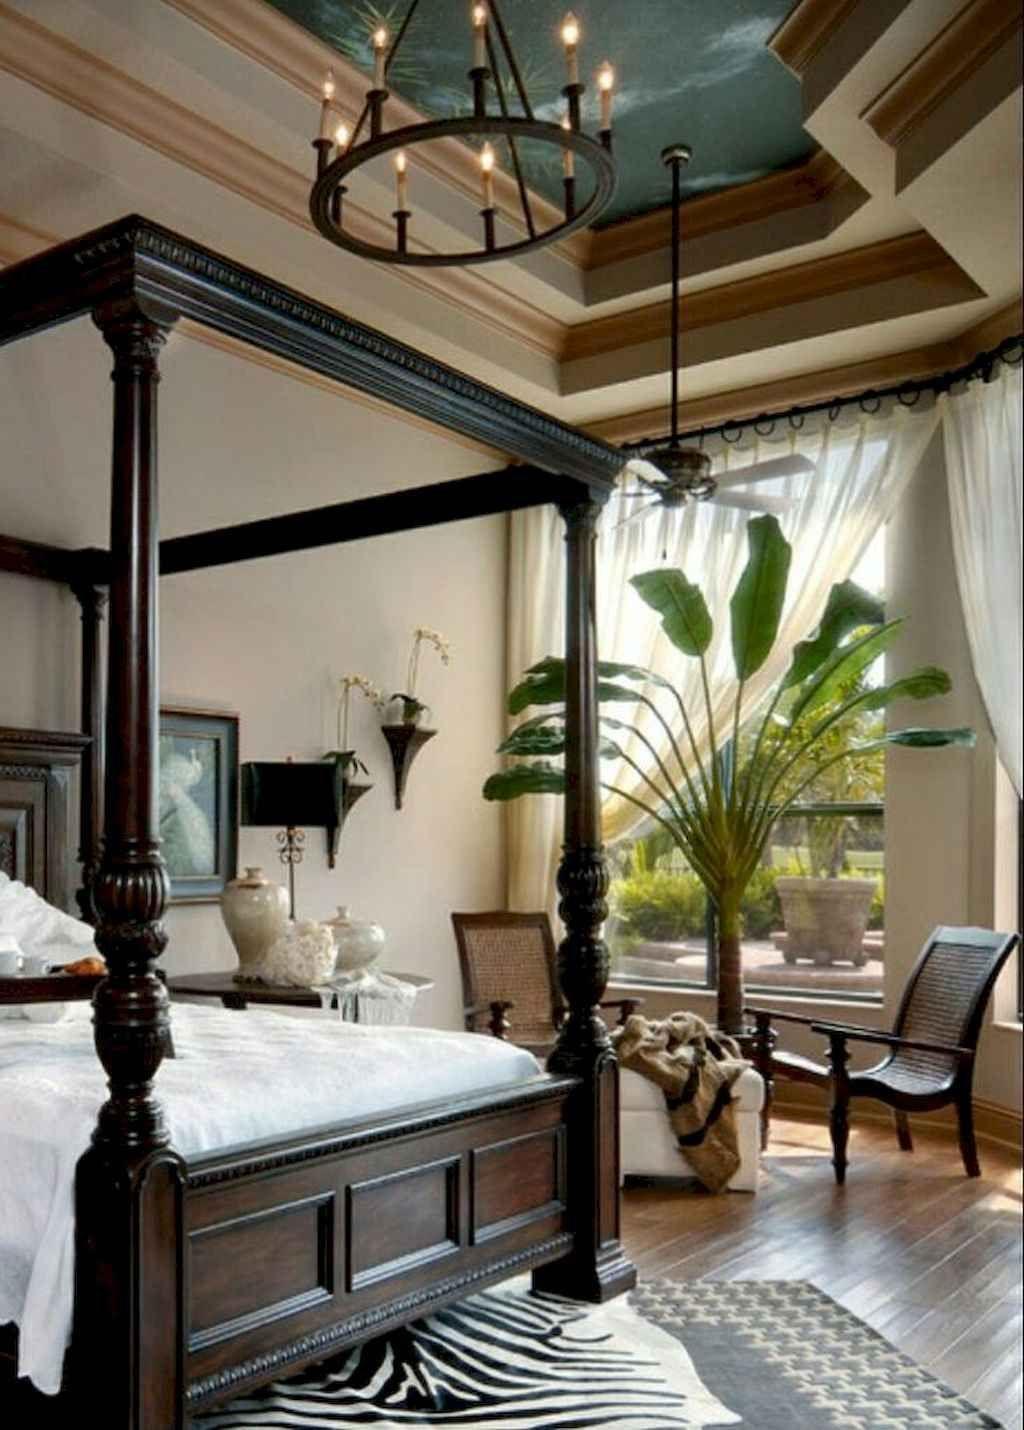 Cool 12 Rustic Coastal Master Bedroom Ideas https://domakeover.com